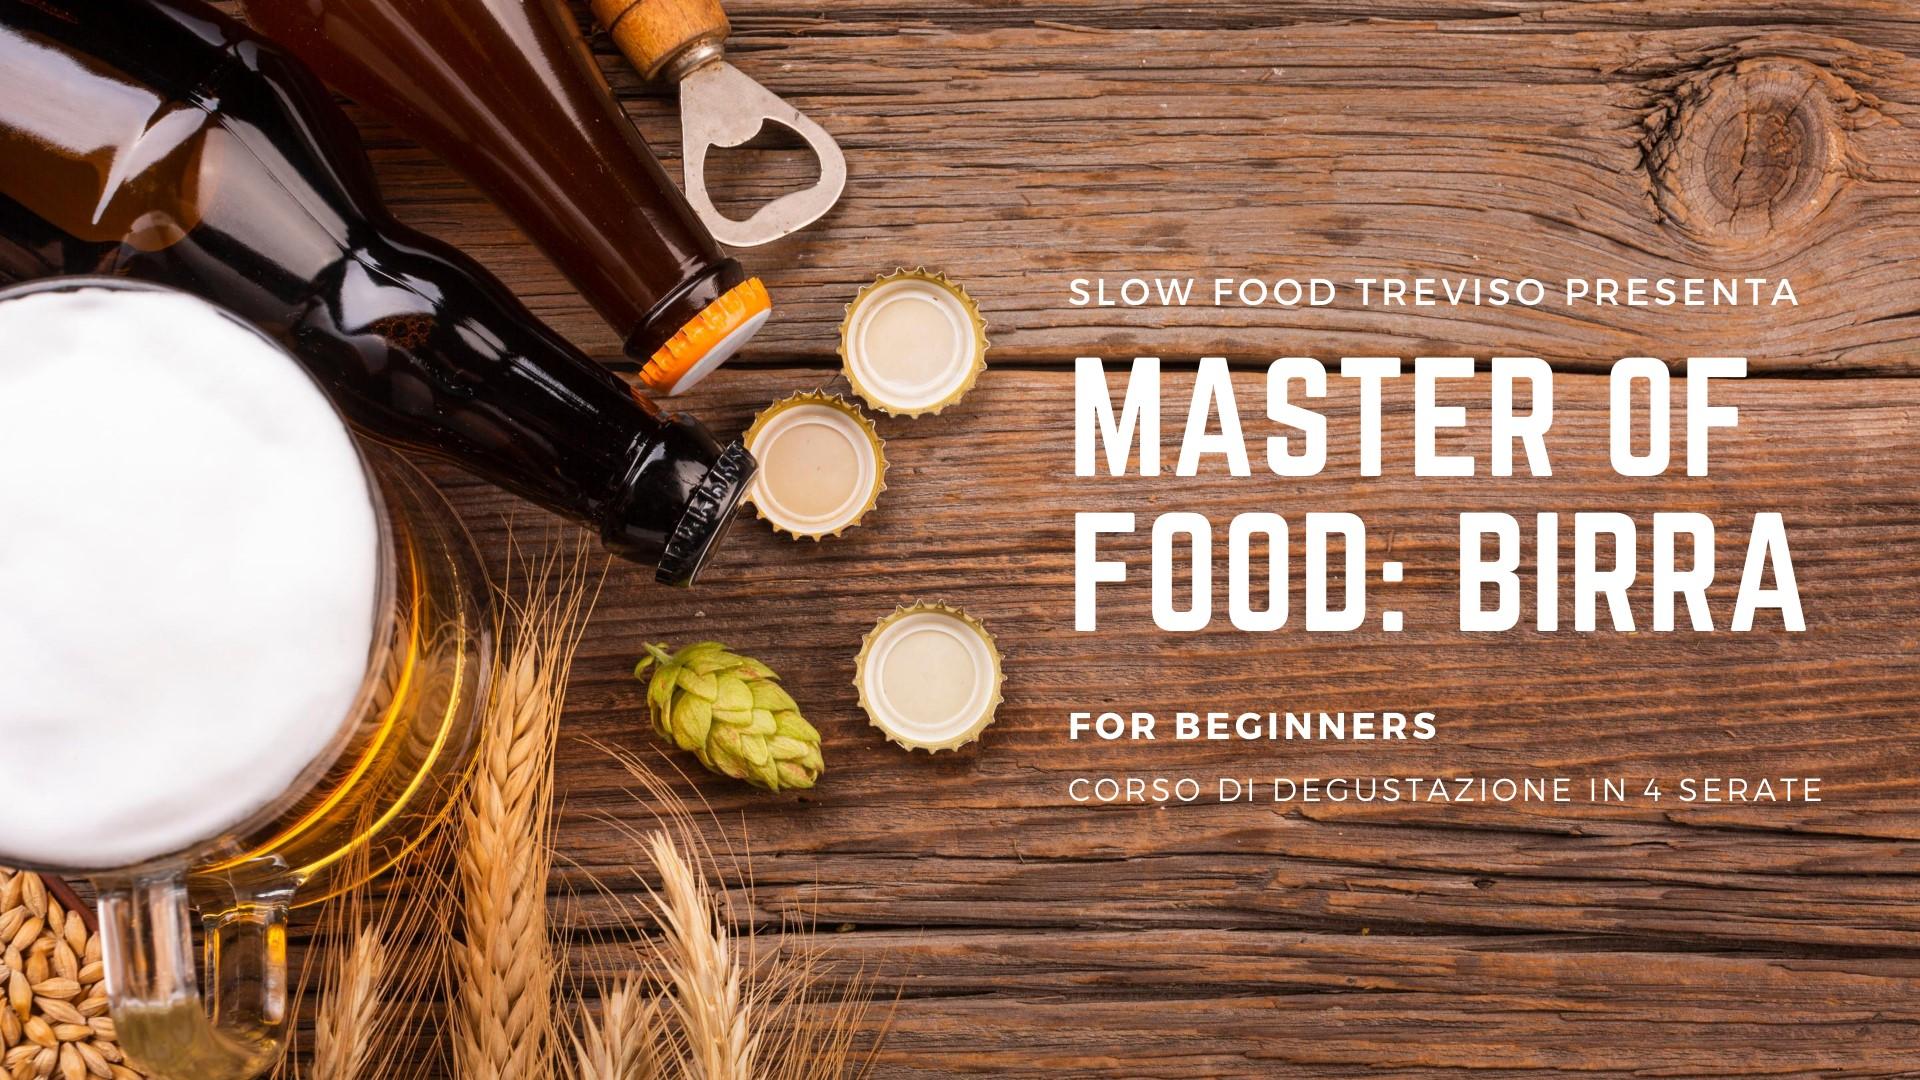 Master of food: birra